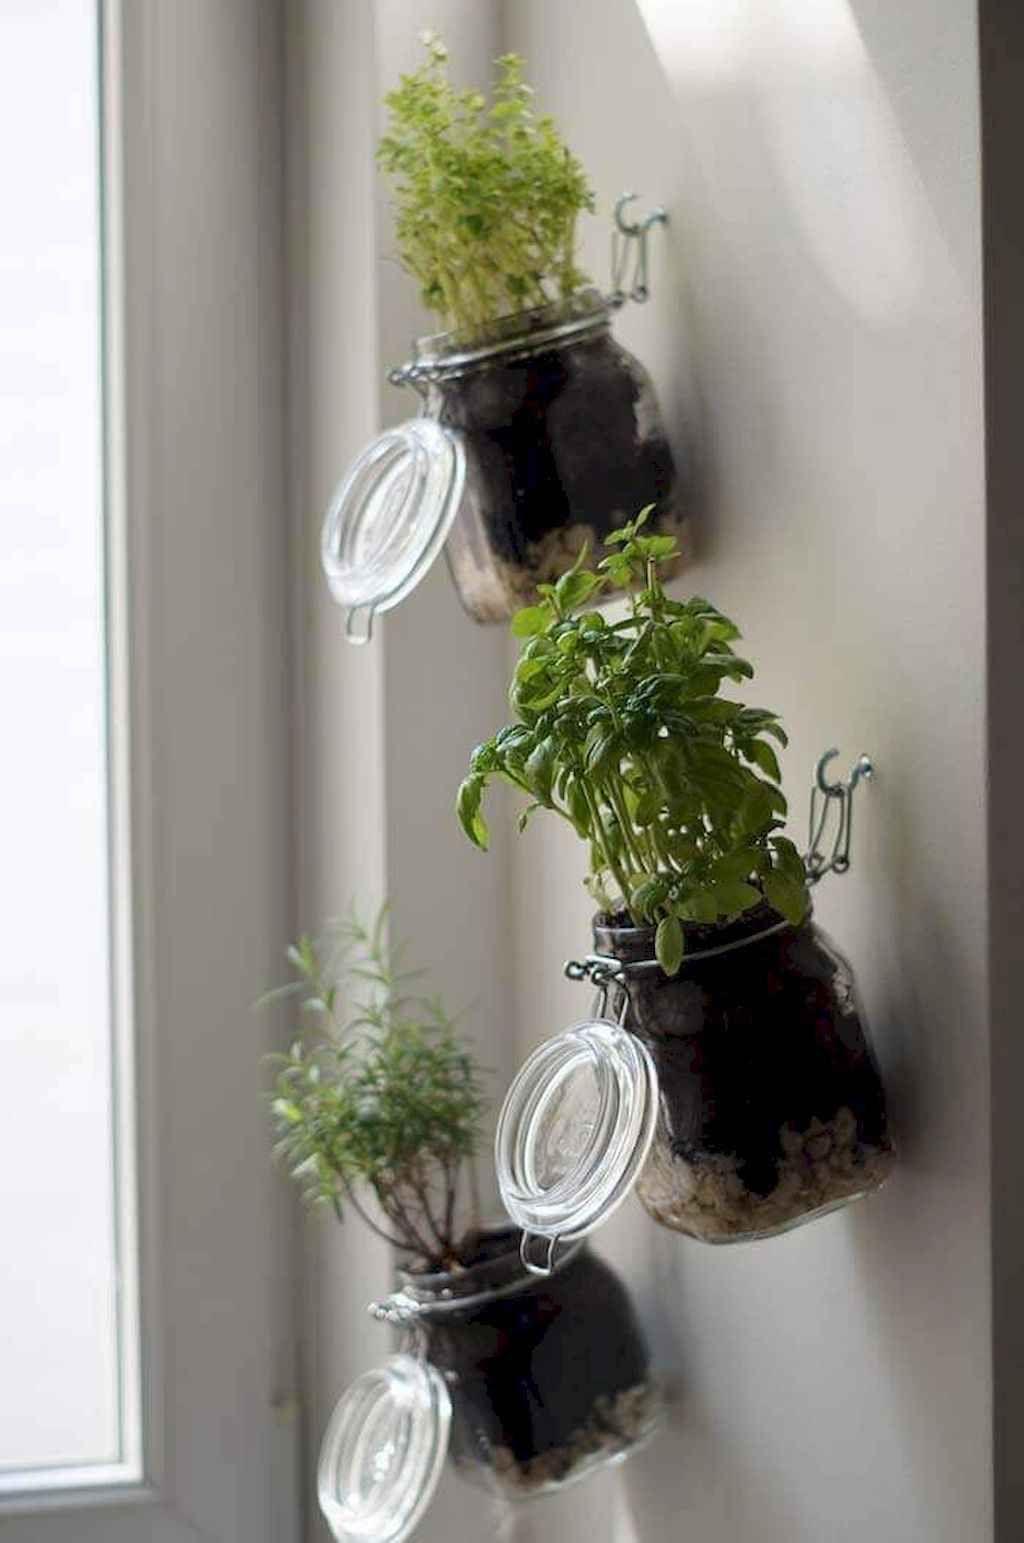 76 amazing diy vertical garden design ideas with images on indoor herb garden diy wall mason jars id=59689